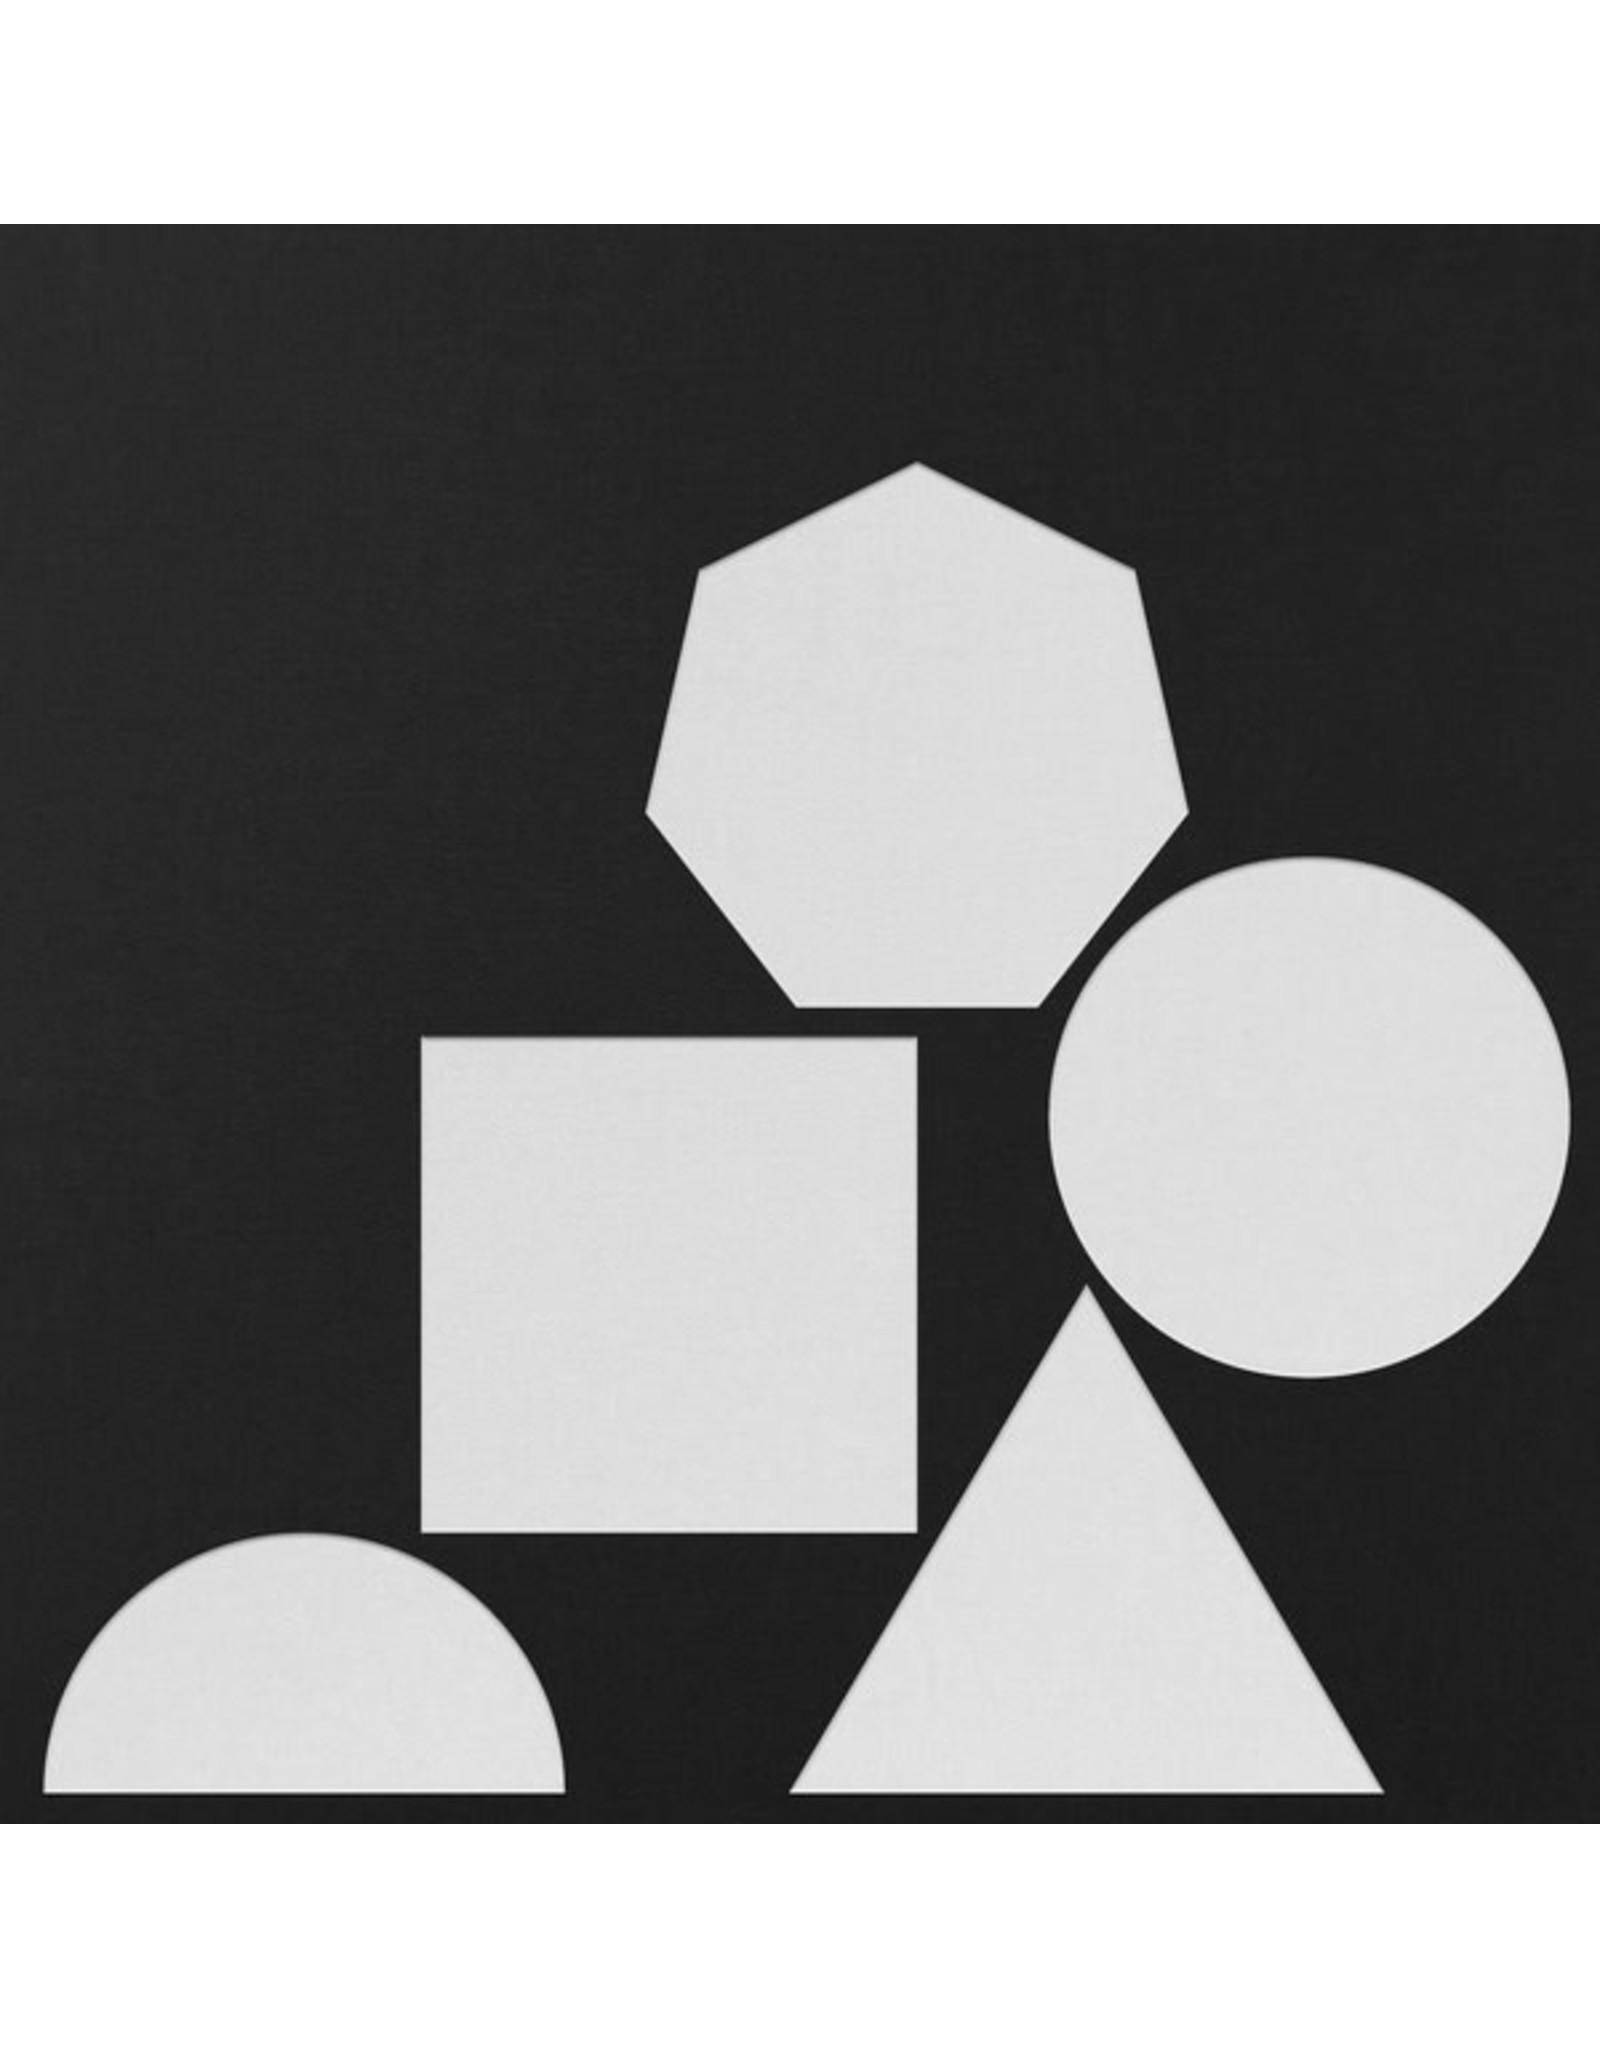 Lapsus Pye Corner Audio: Black Mill Tapes 5LP BOX